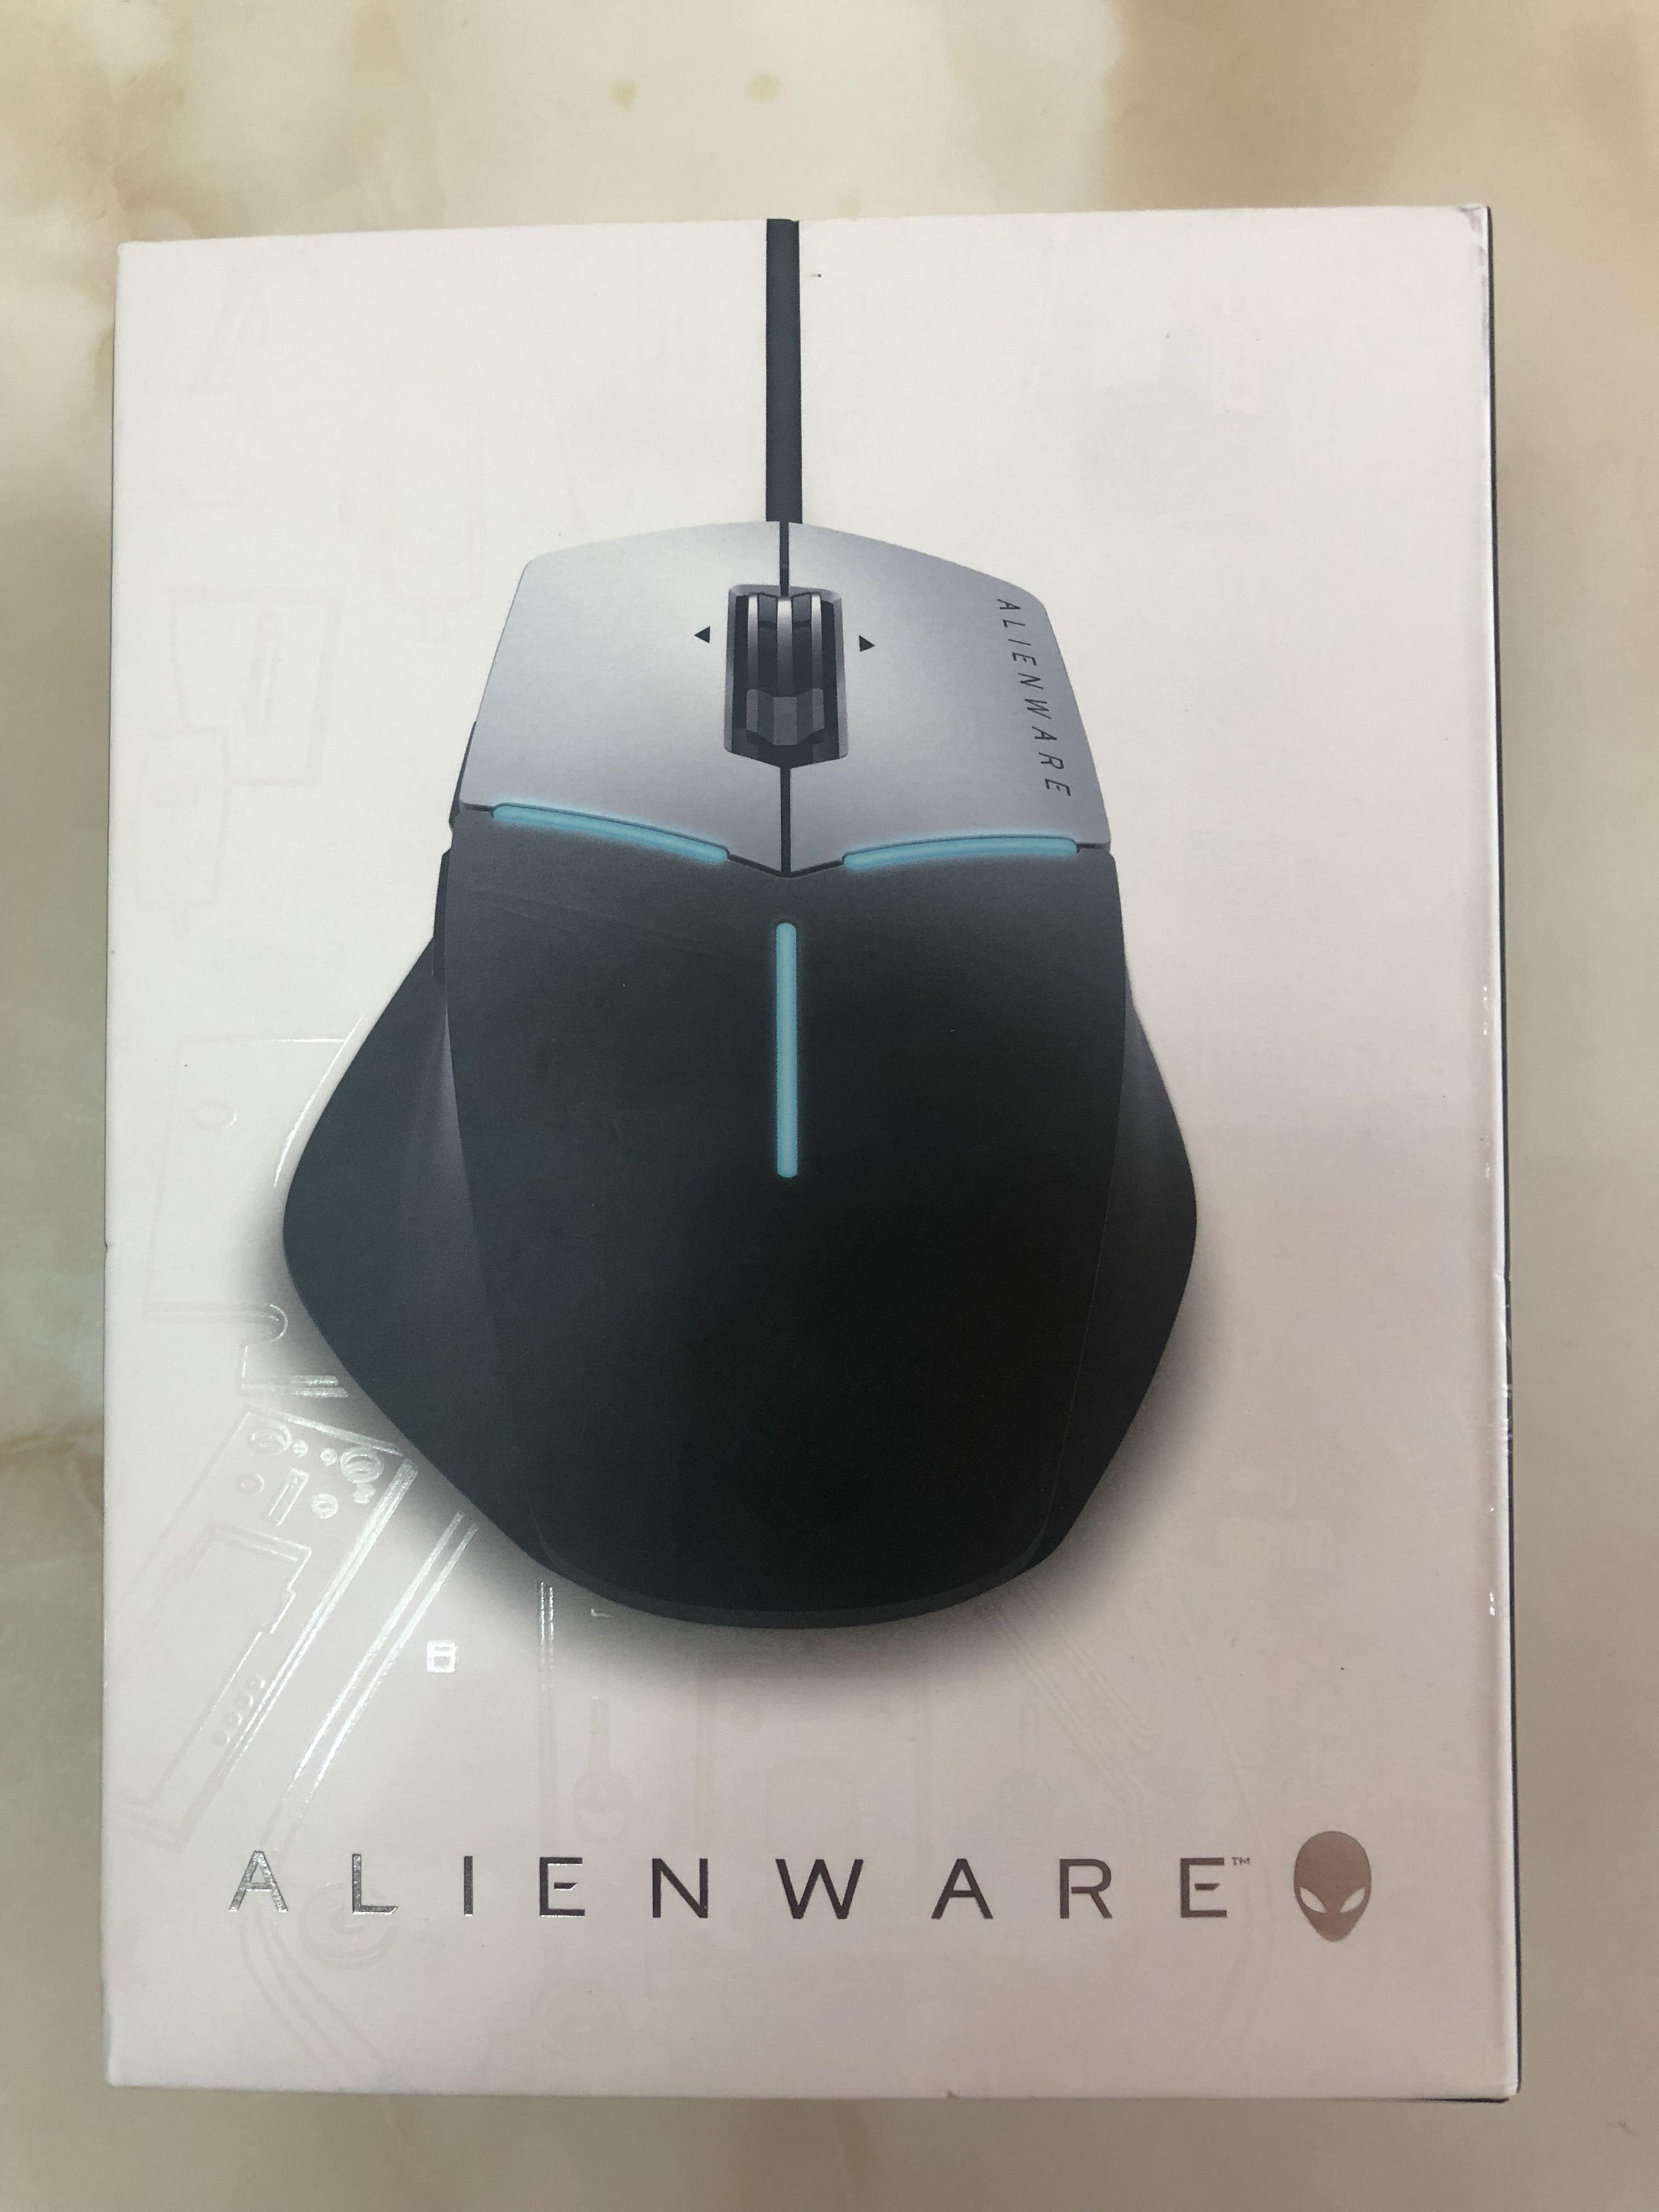 Alienware外星人鼠标/键盘AW558 AW958 AW568 AW768全新美行现货